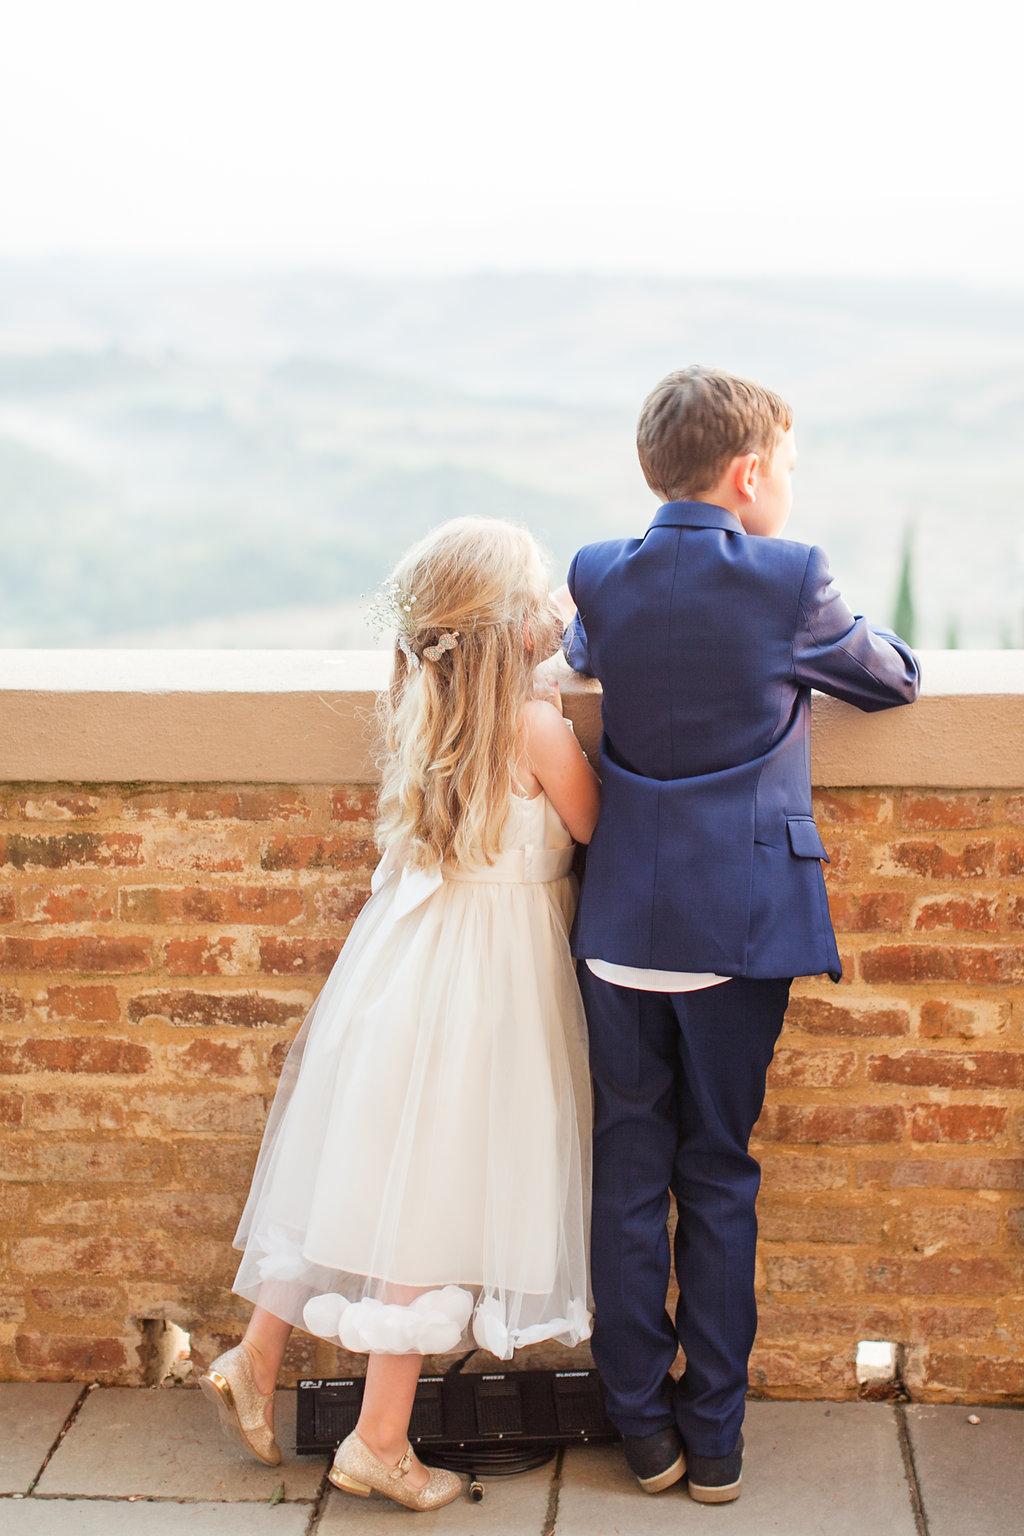 castelfalfi-tuscany-wedding-photographer-roberta-facchini-347